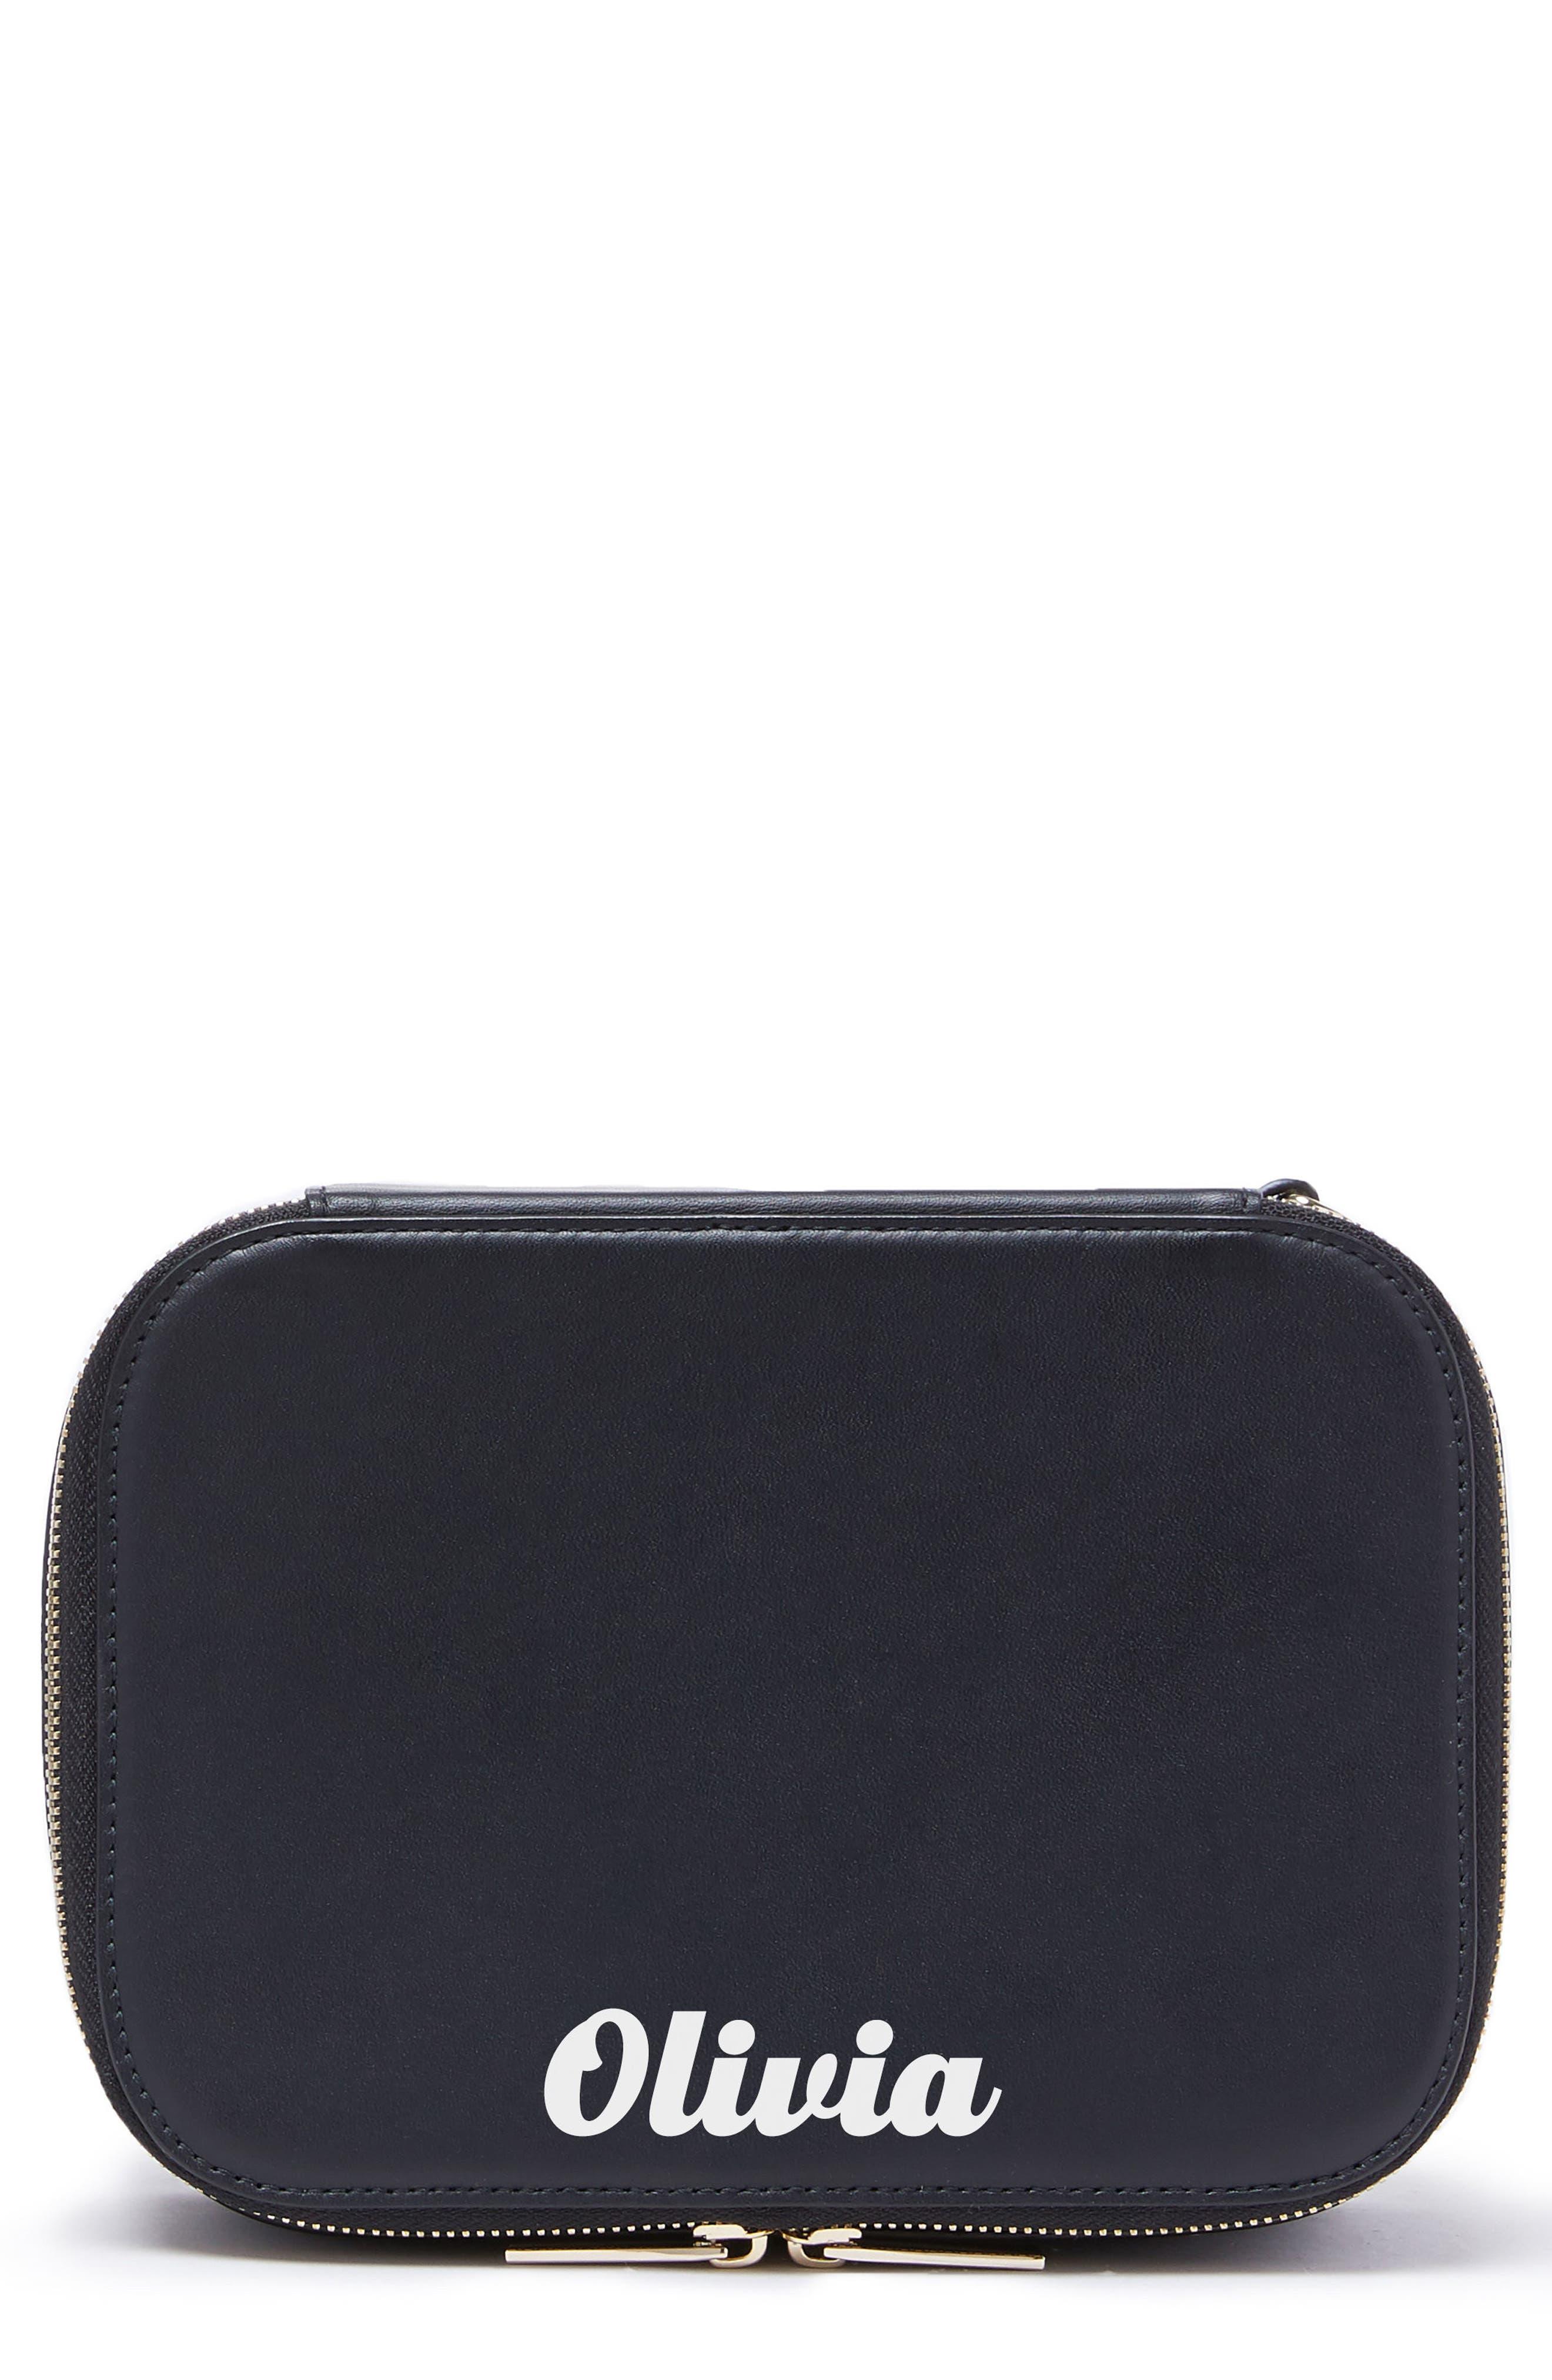 Bigger Personalized Makeup Bag,                             Main thumbnail 1, color,                             001